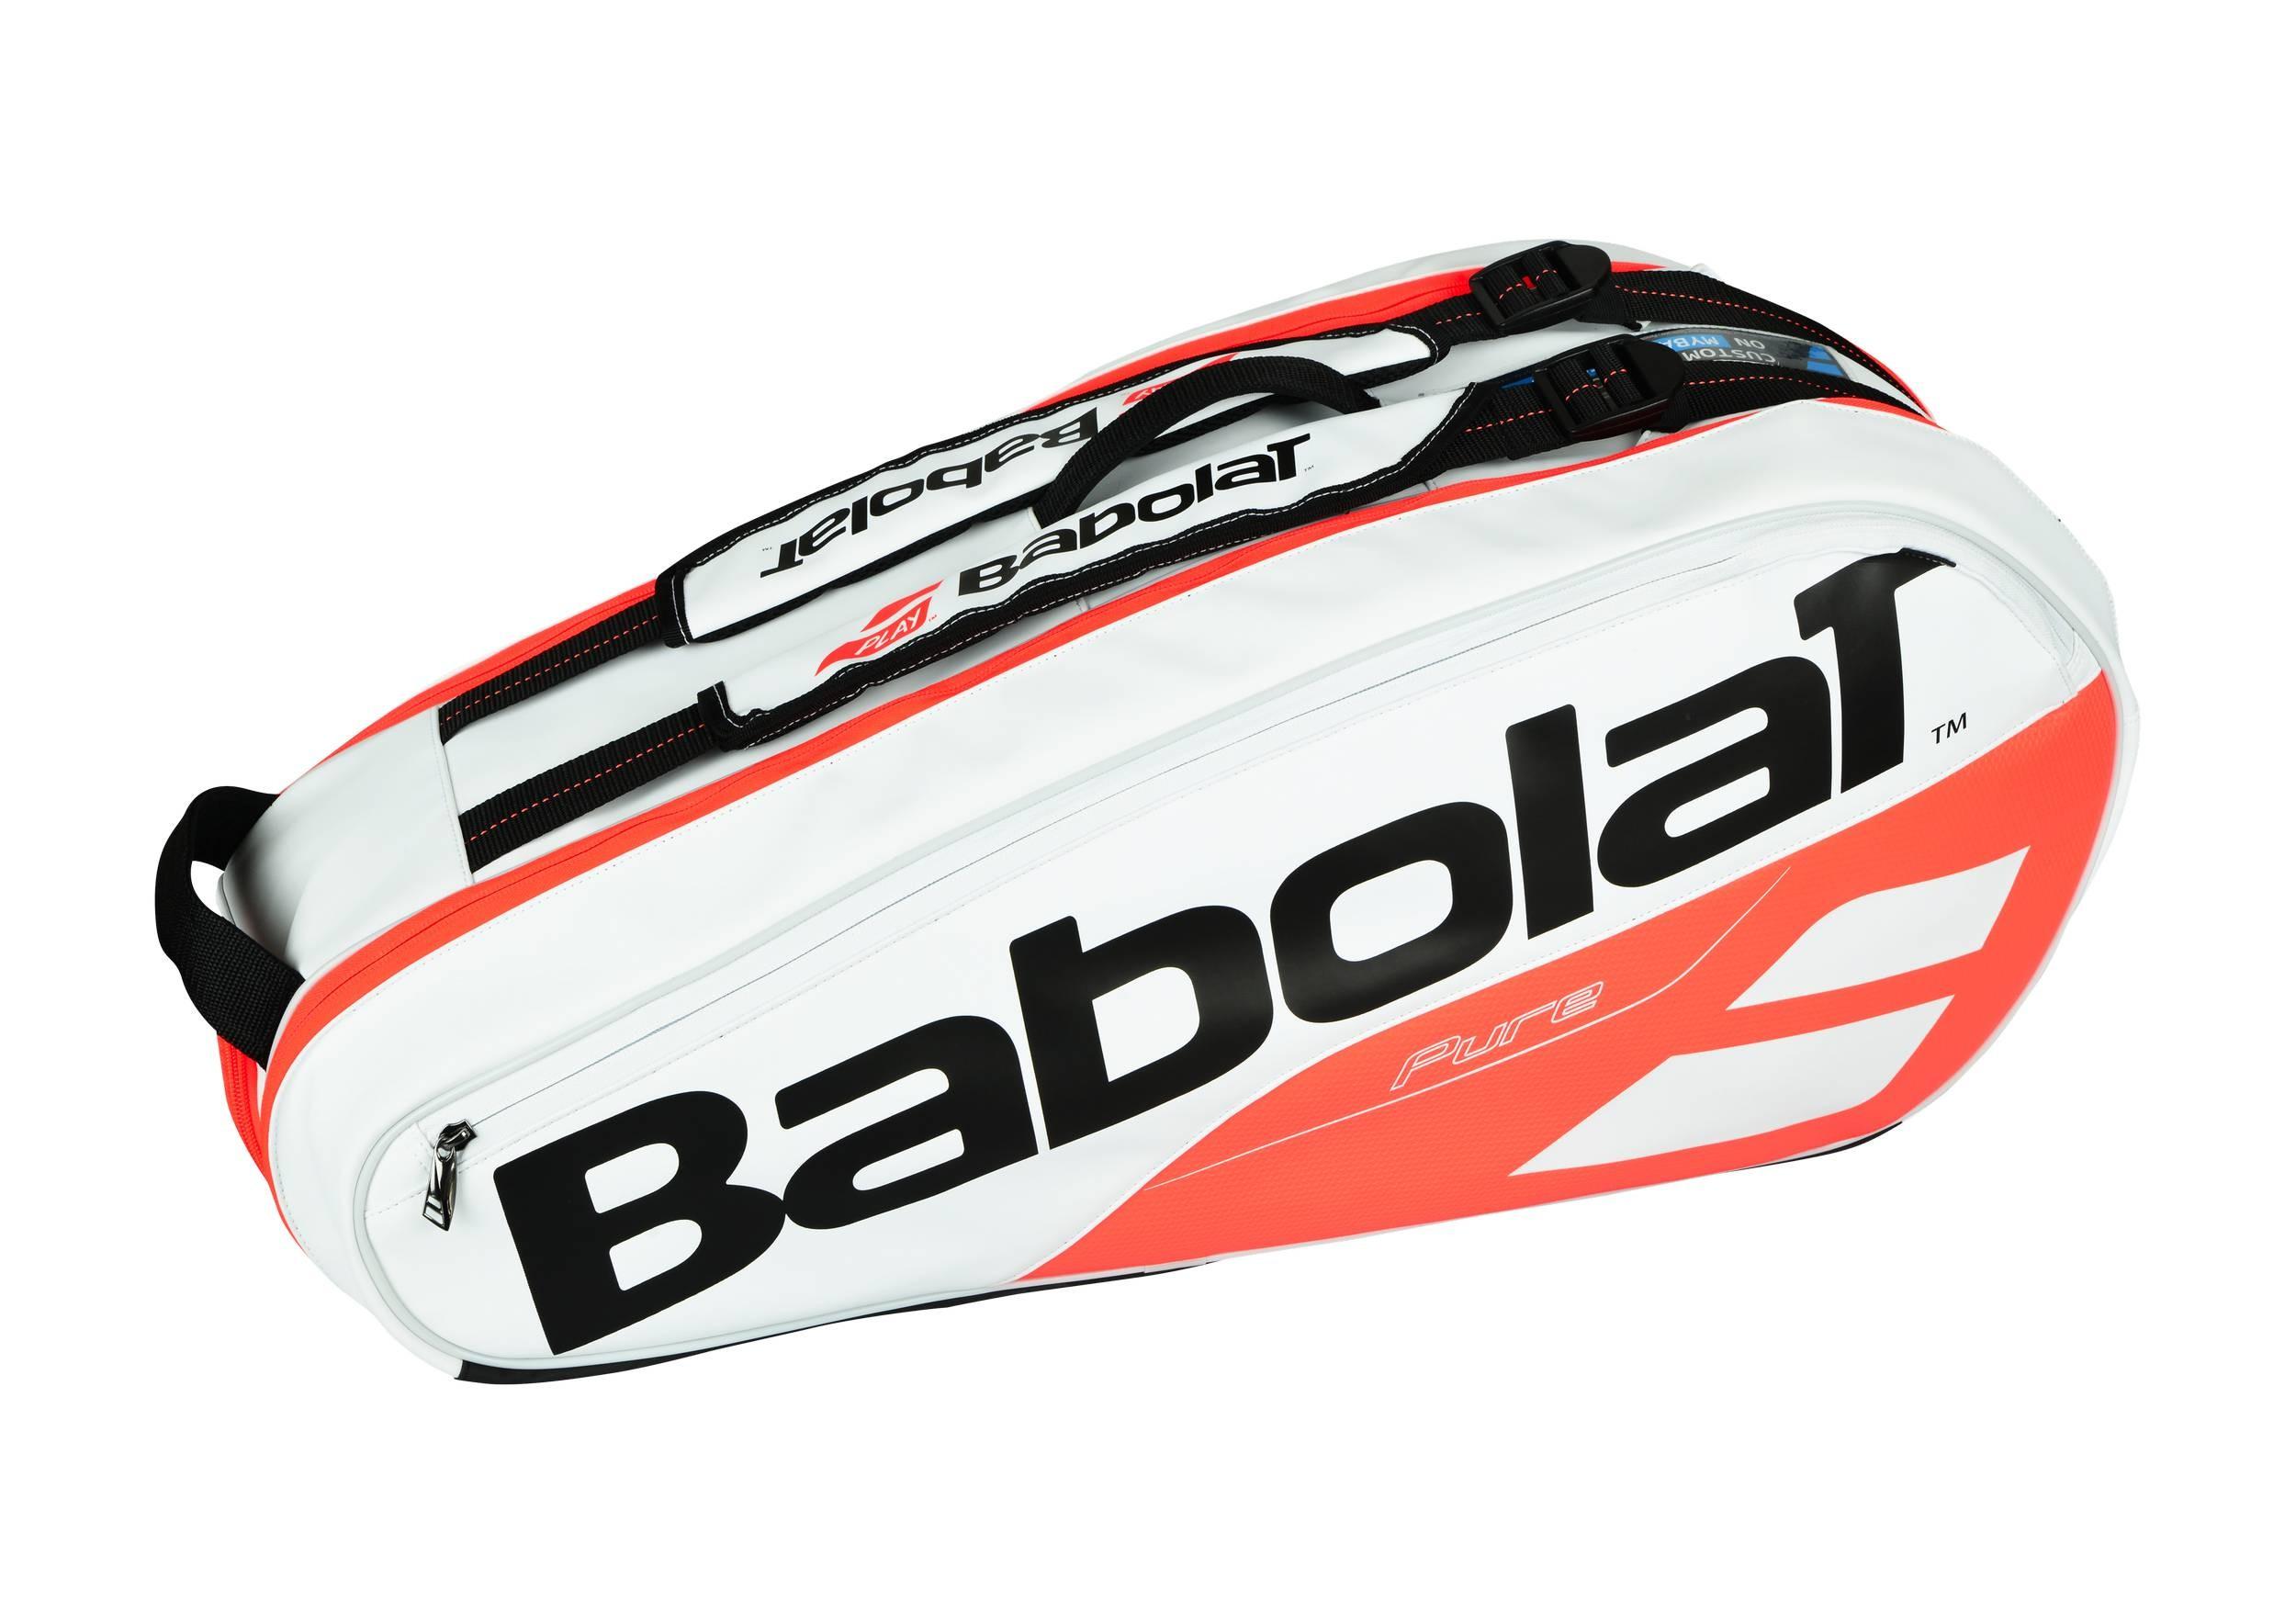 Torba tenisowa Babolat Pure Strike x6 2018